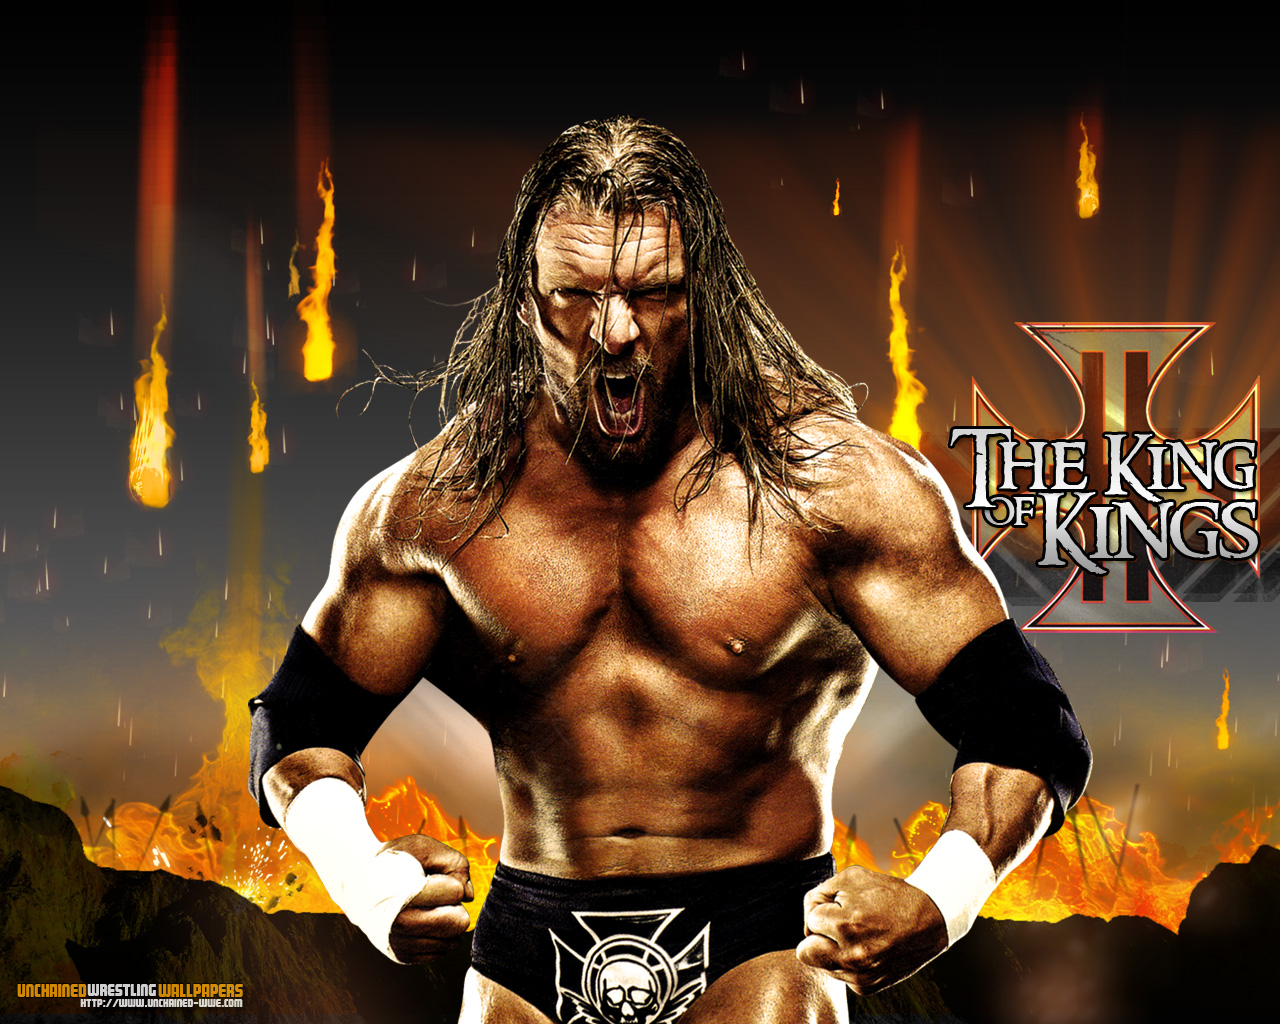 Wwe Triple H Wallpapers Wwe Wrestling Wallpapers